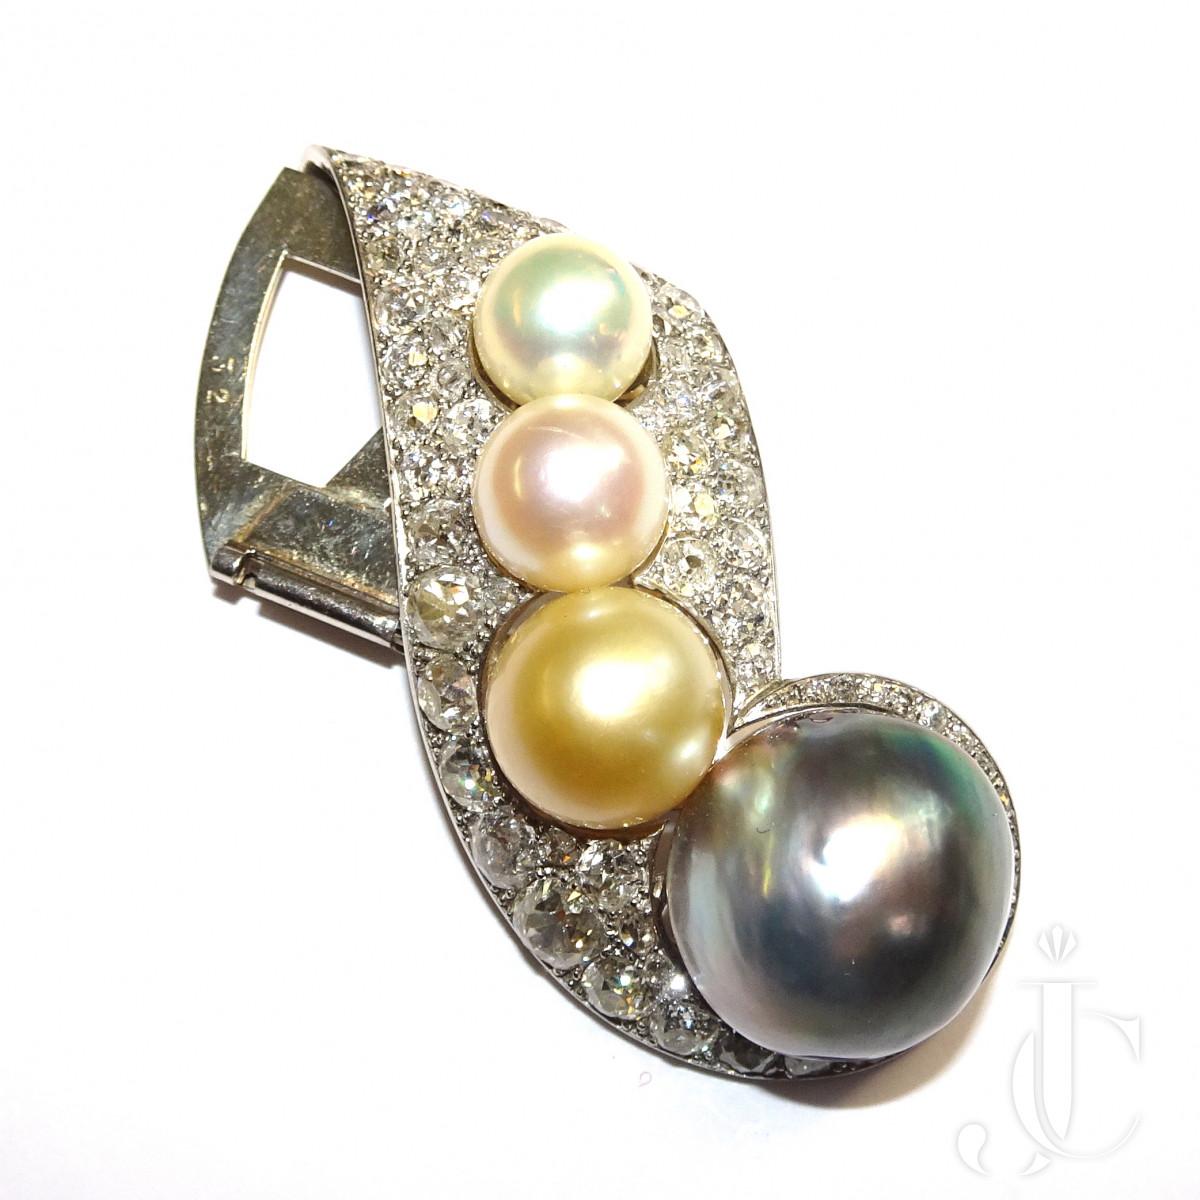 Rene Boivin Cult.Pearl Diamond Brooch